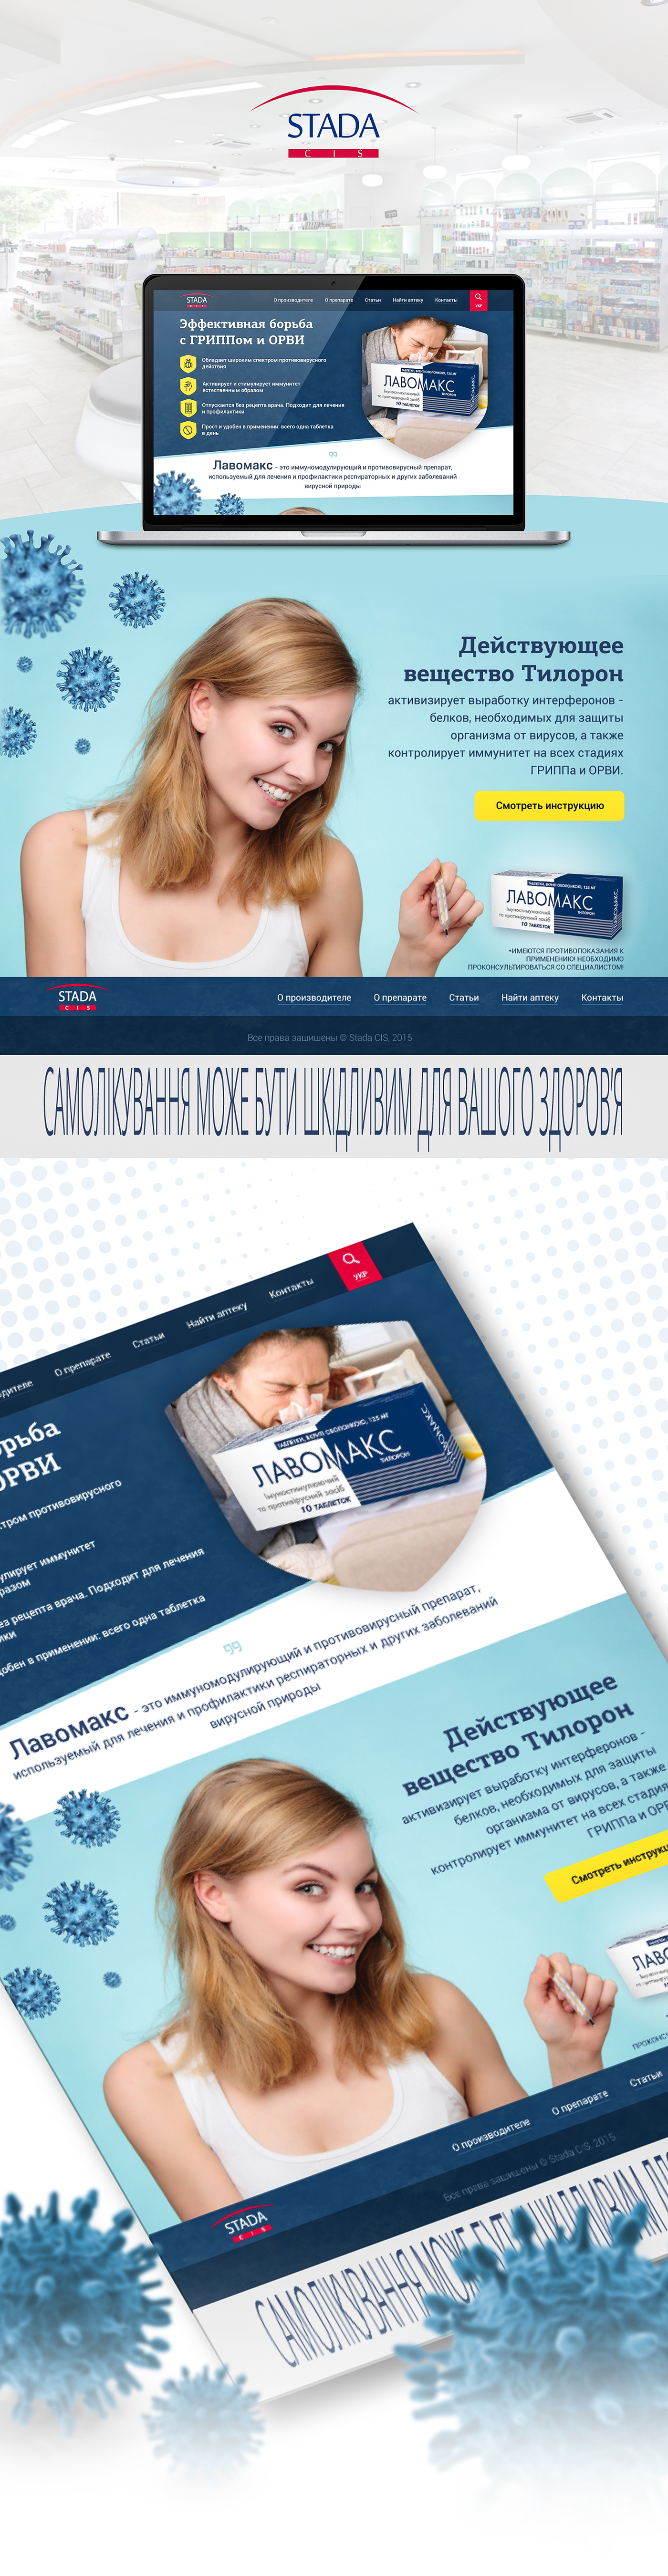 STADA Website Web Design